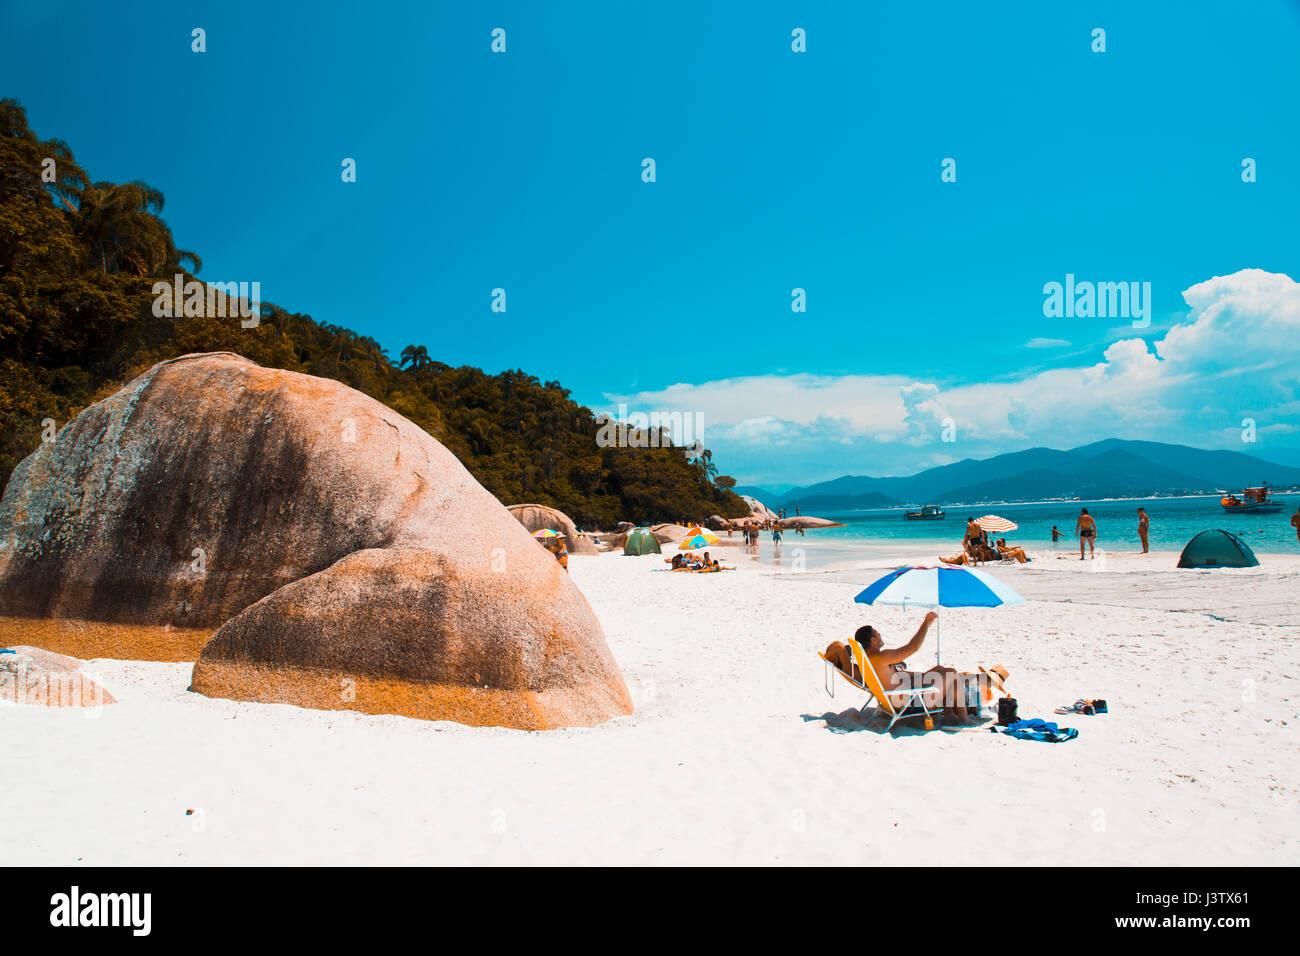 sunbathing tourist at the beach of ilha do campeche, Florianópolis - SC - br - Stock Image